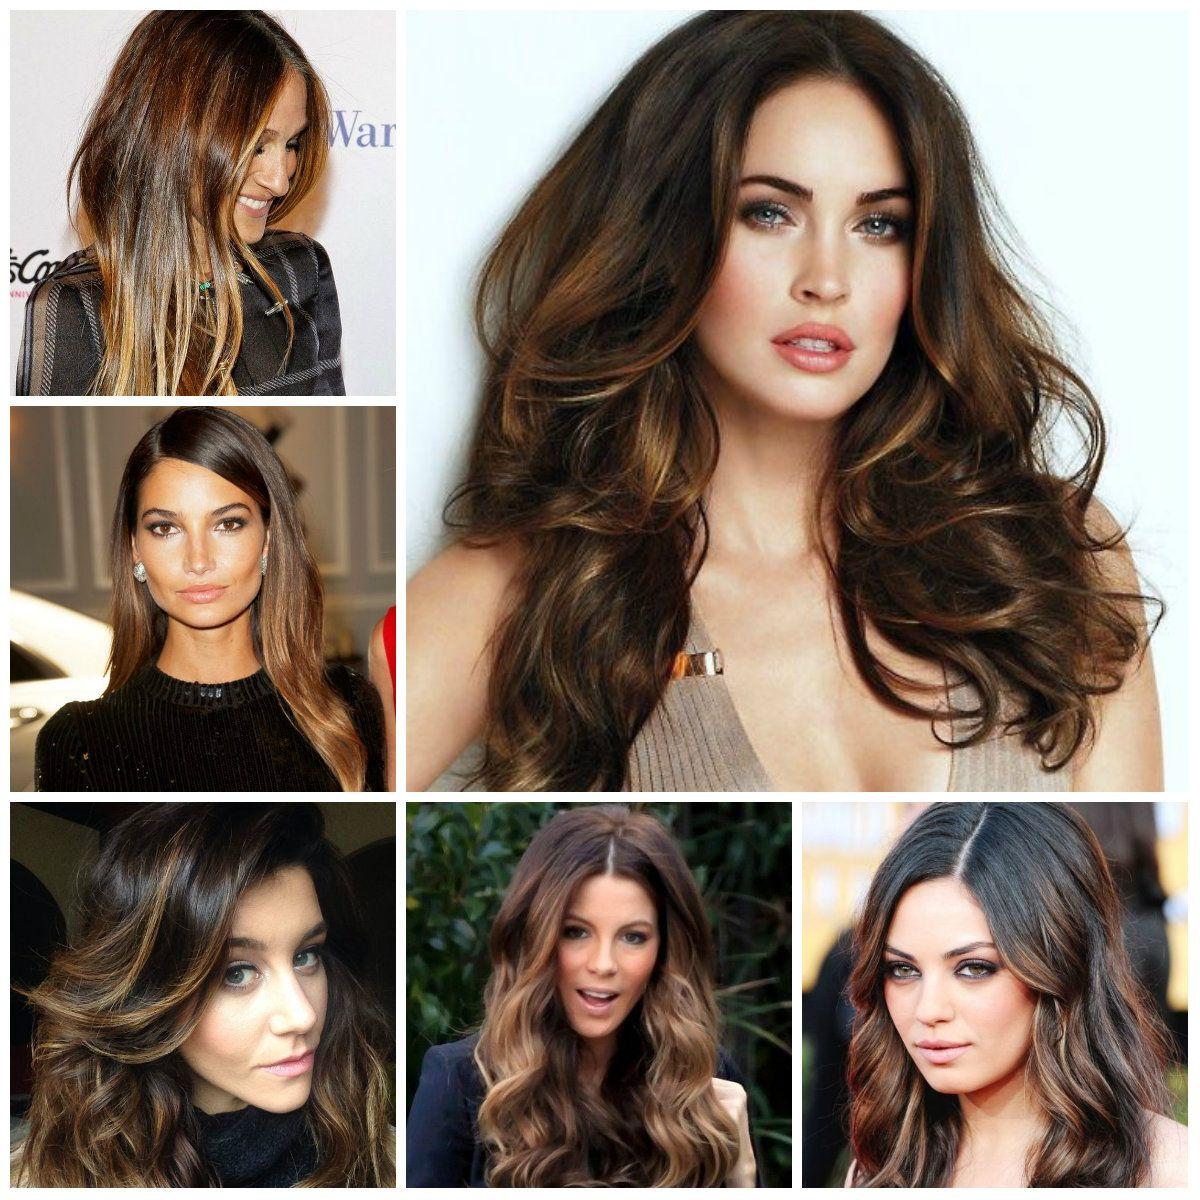 Hair highlights 2016 haircuts hairstyles 2016 and hair colors for short long medium hairstyles